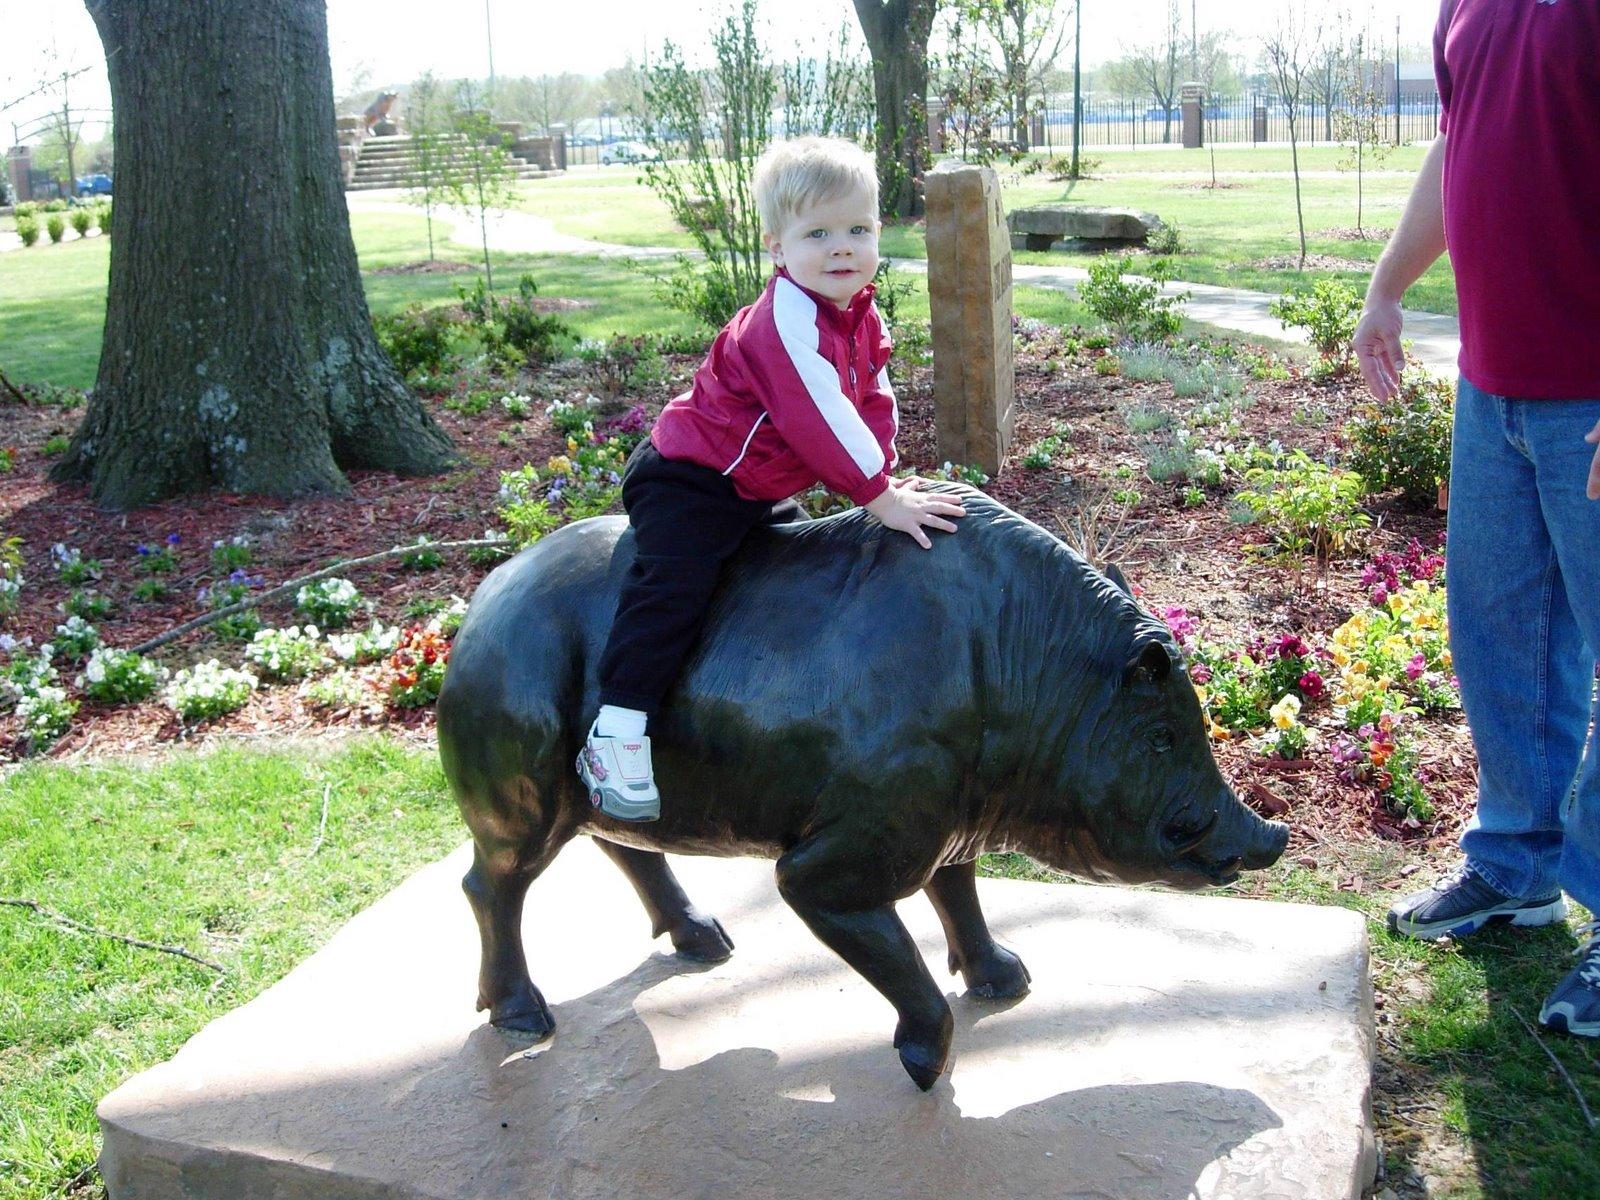 [Luke+rides+the+hog.JPG]